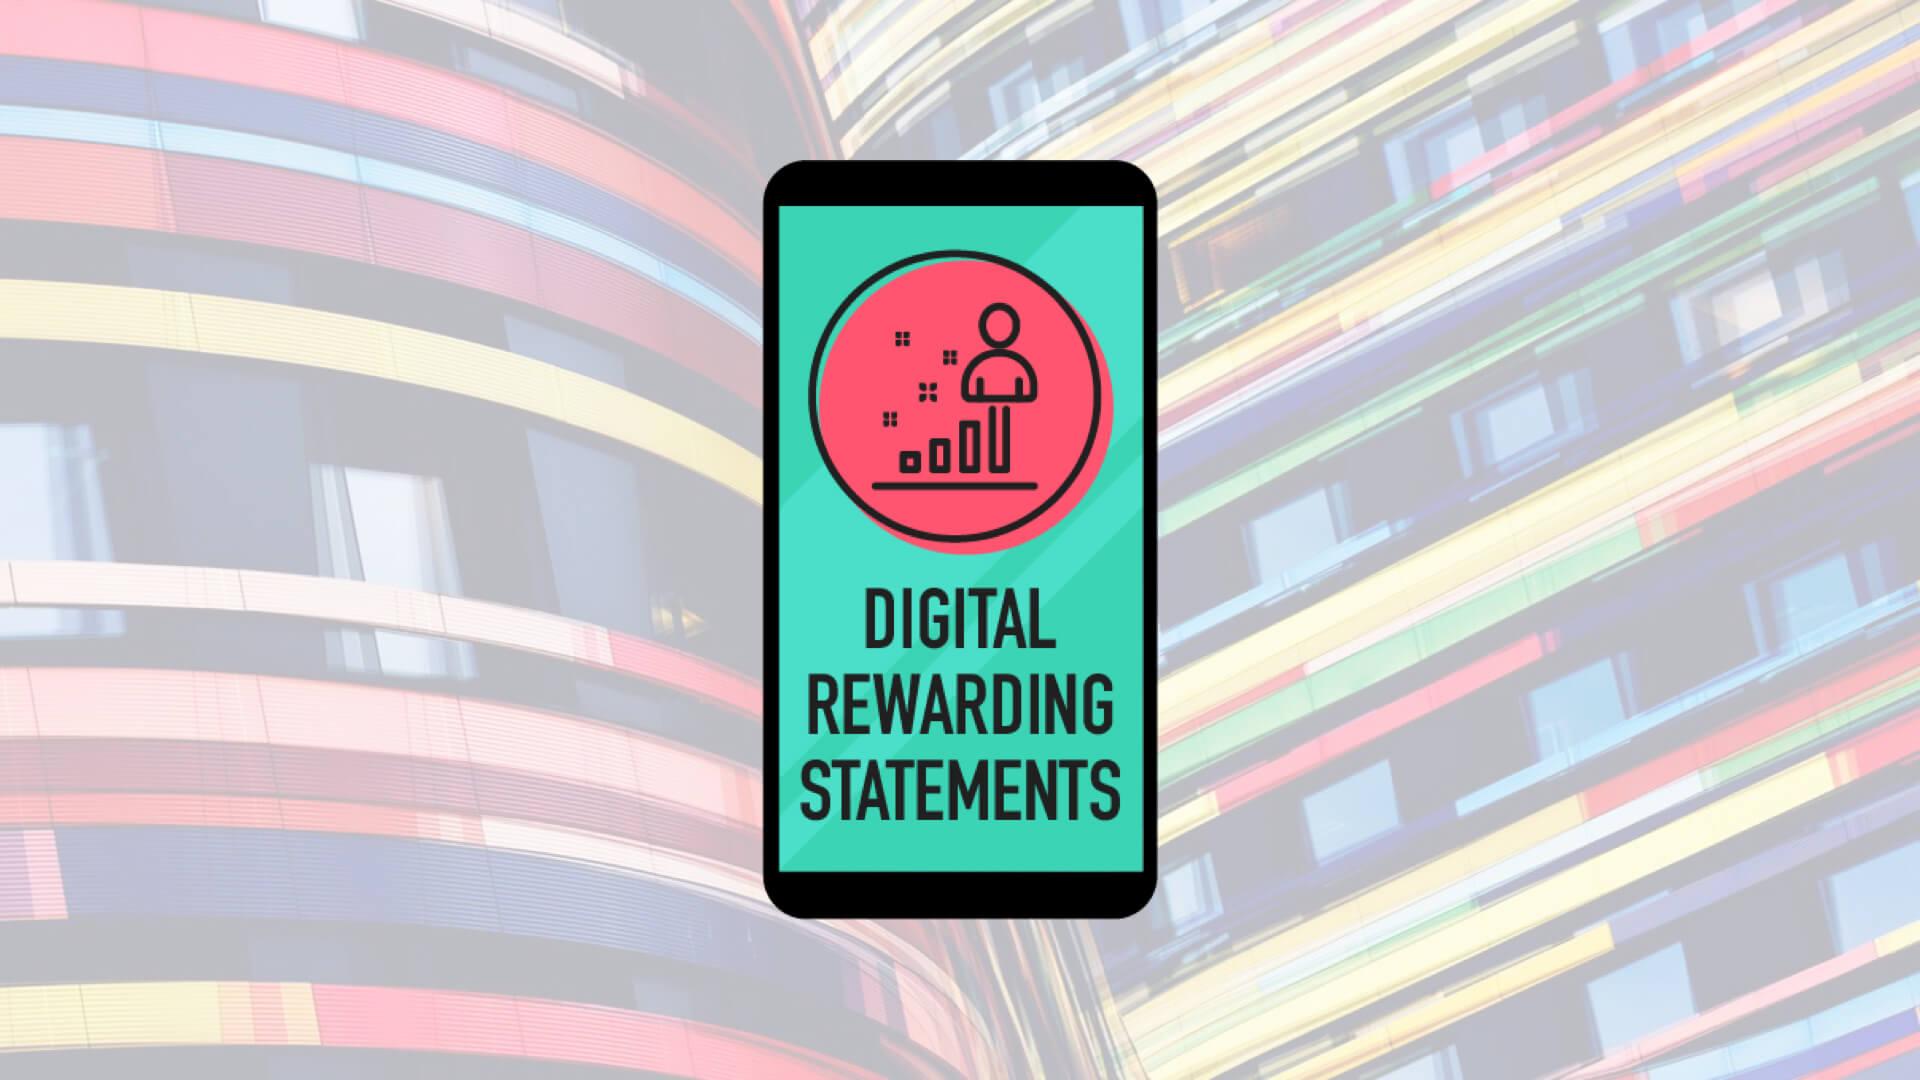 Digital Rewarding Statements